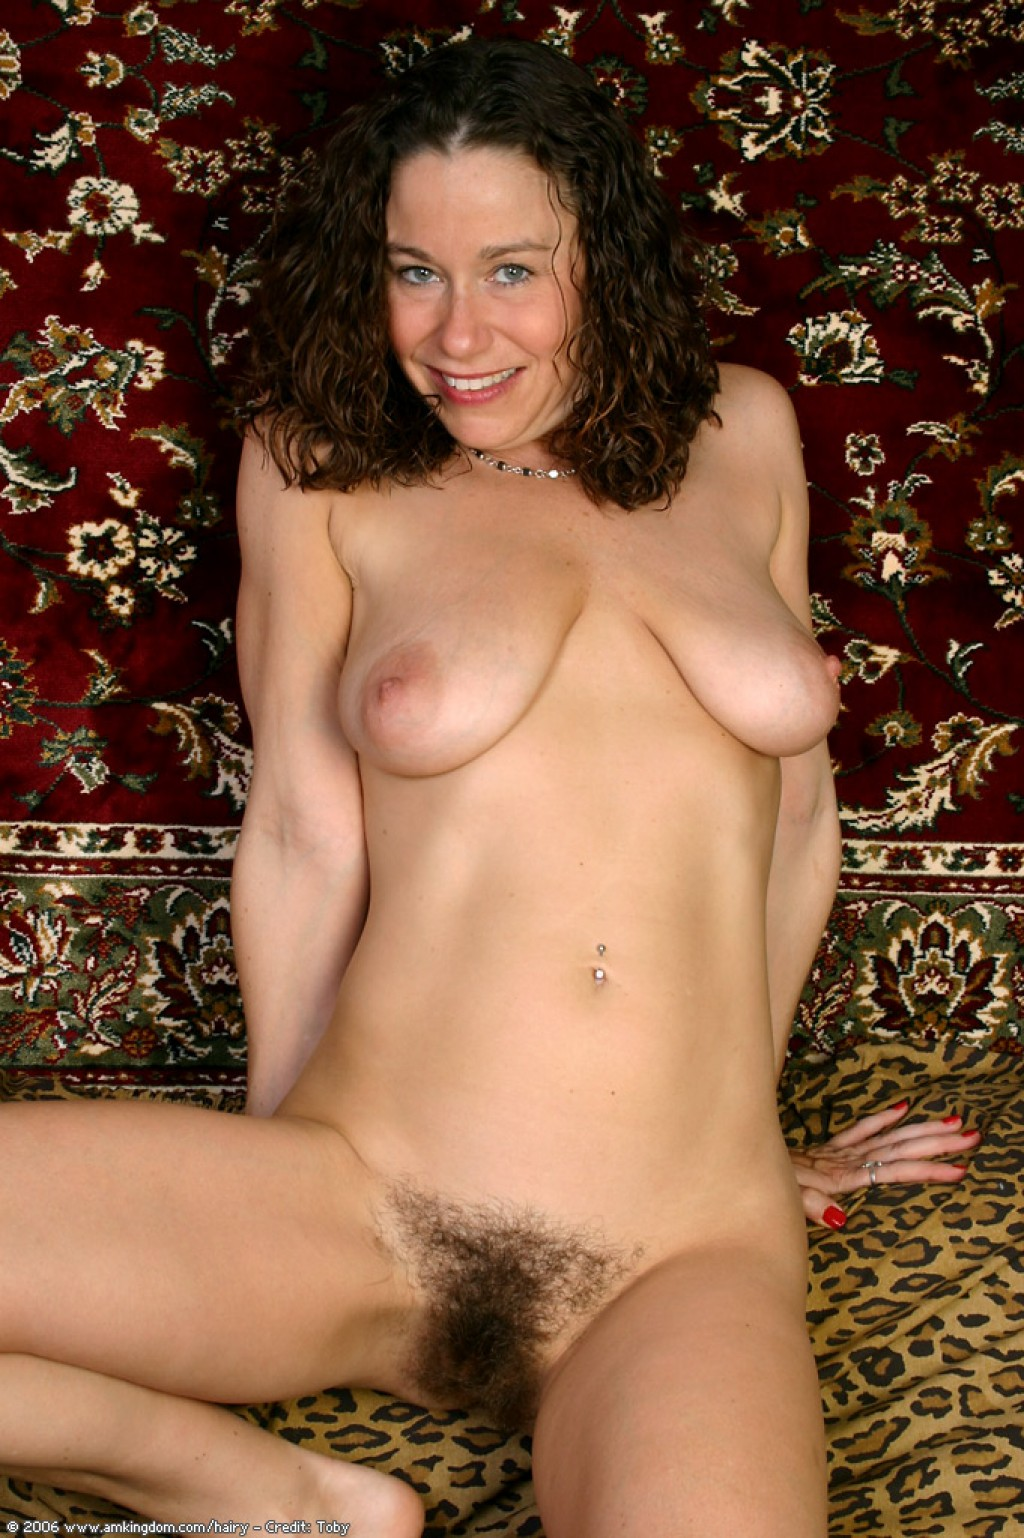 mecca nude photo gallery